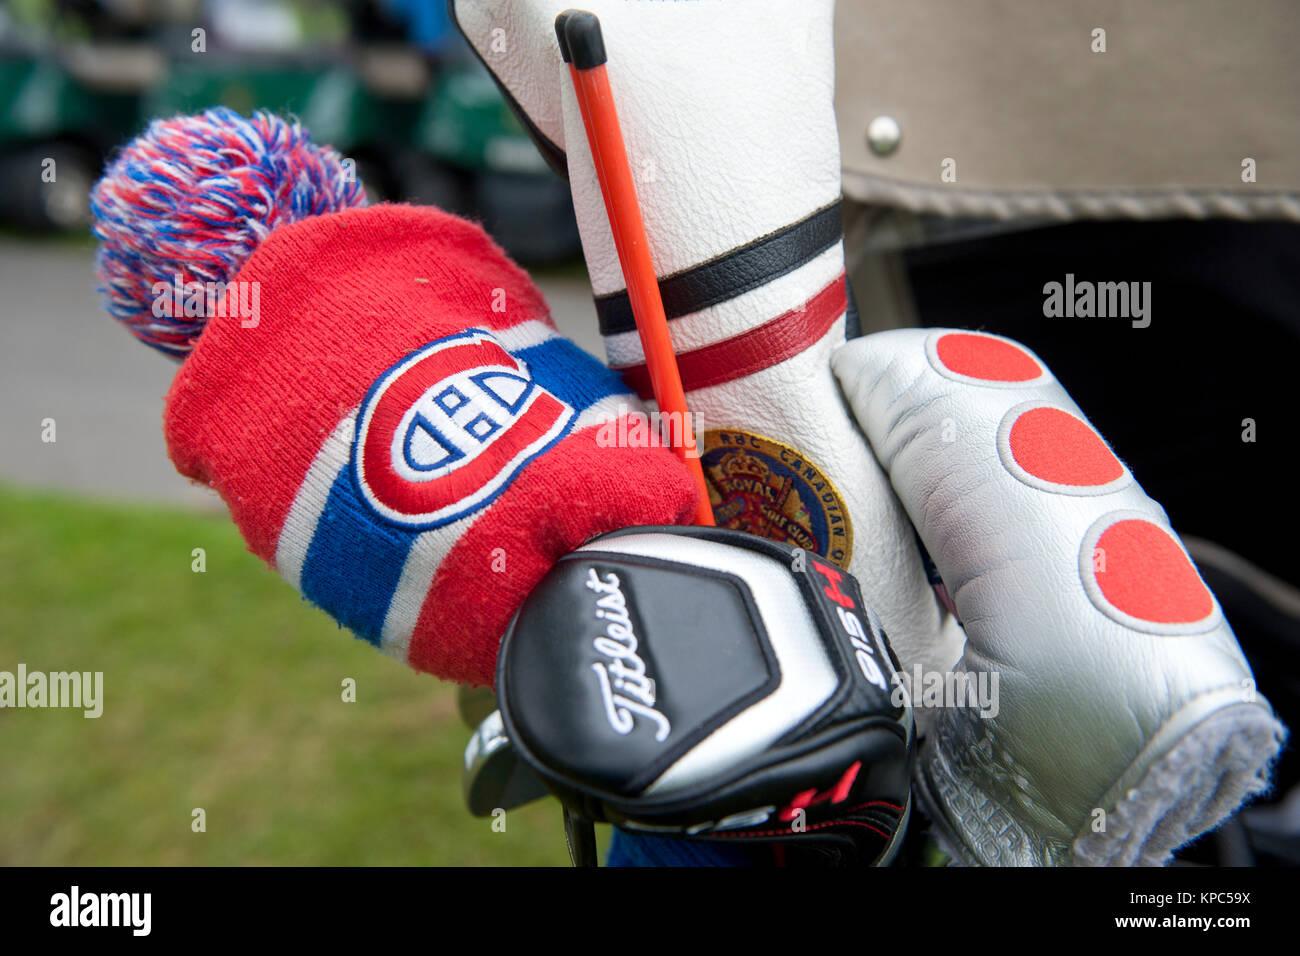 Montreal Canadiens (famoso ice hockey team) golf club headcover. Immagini Stock